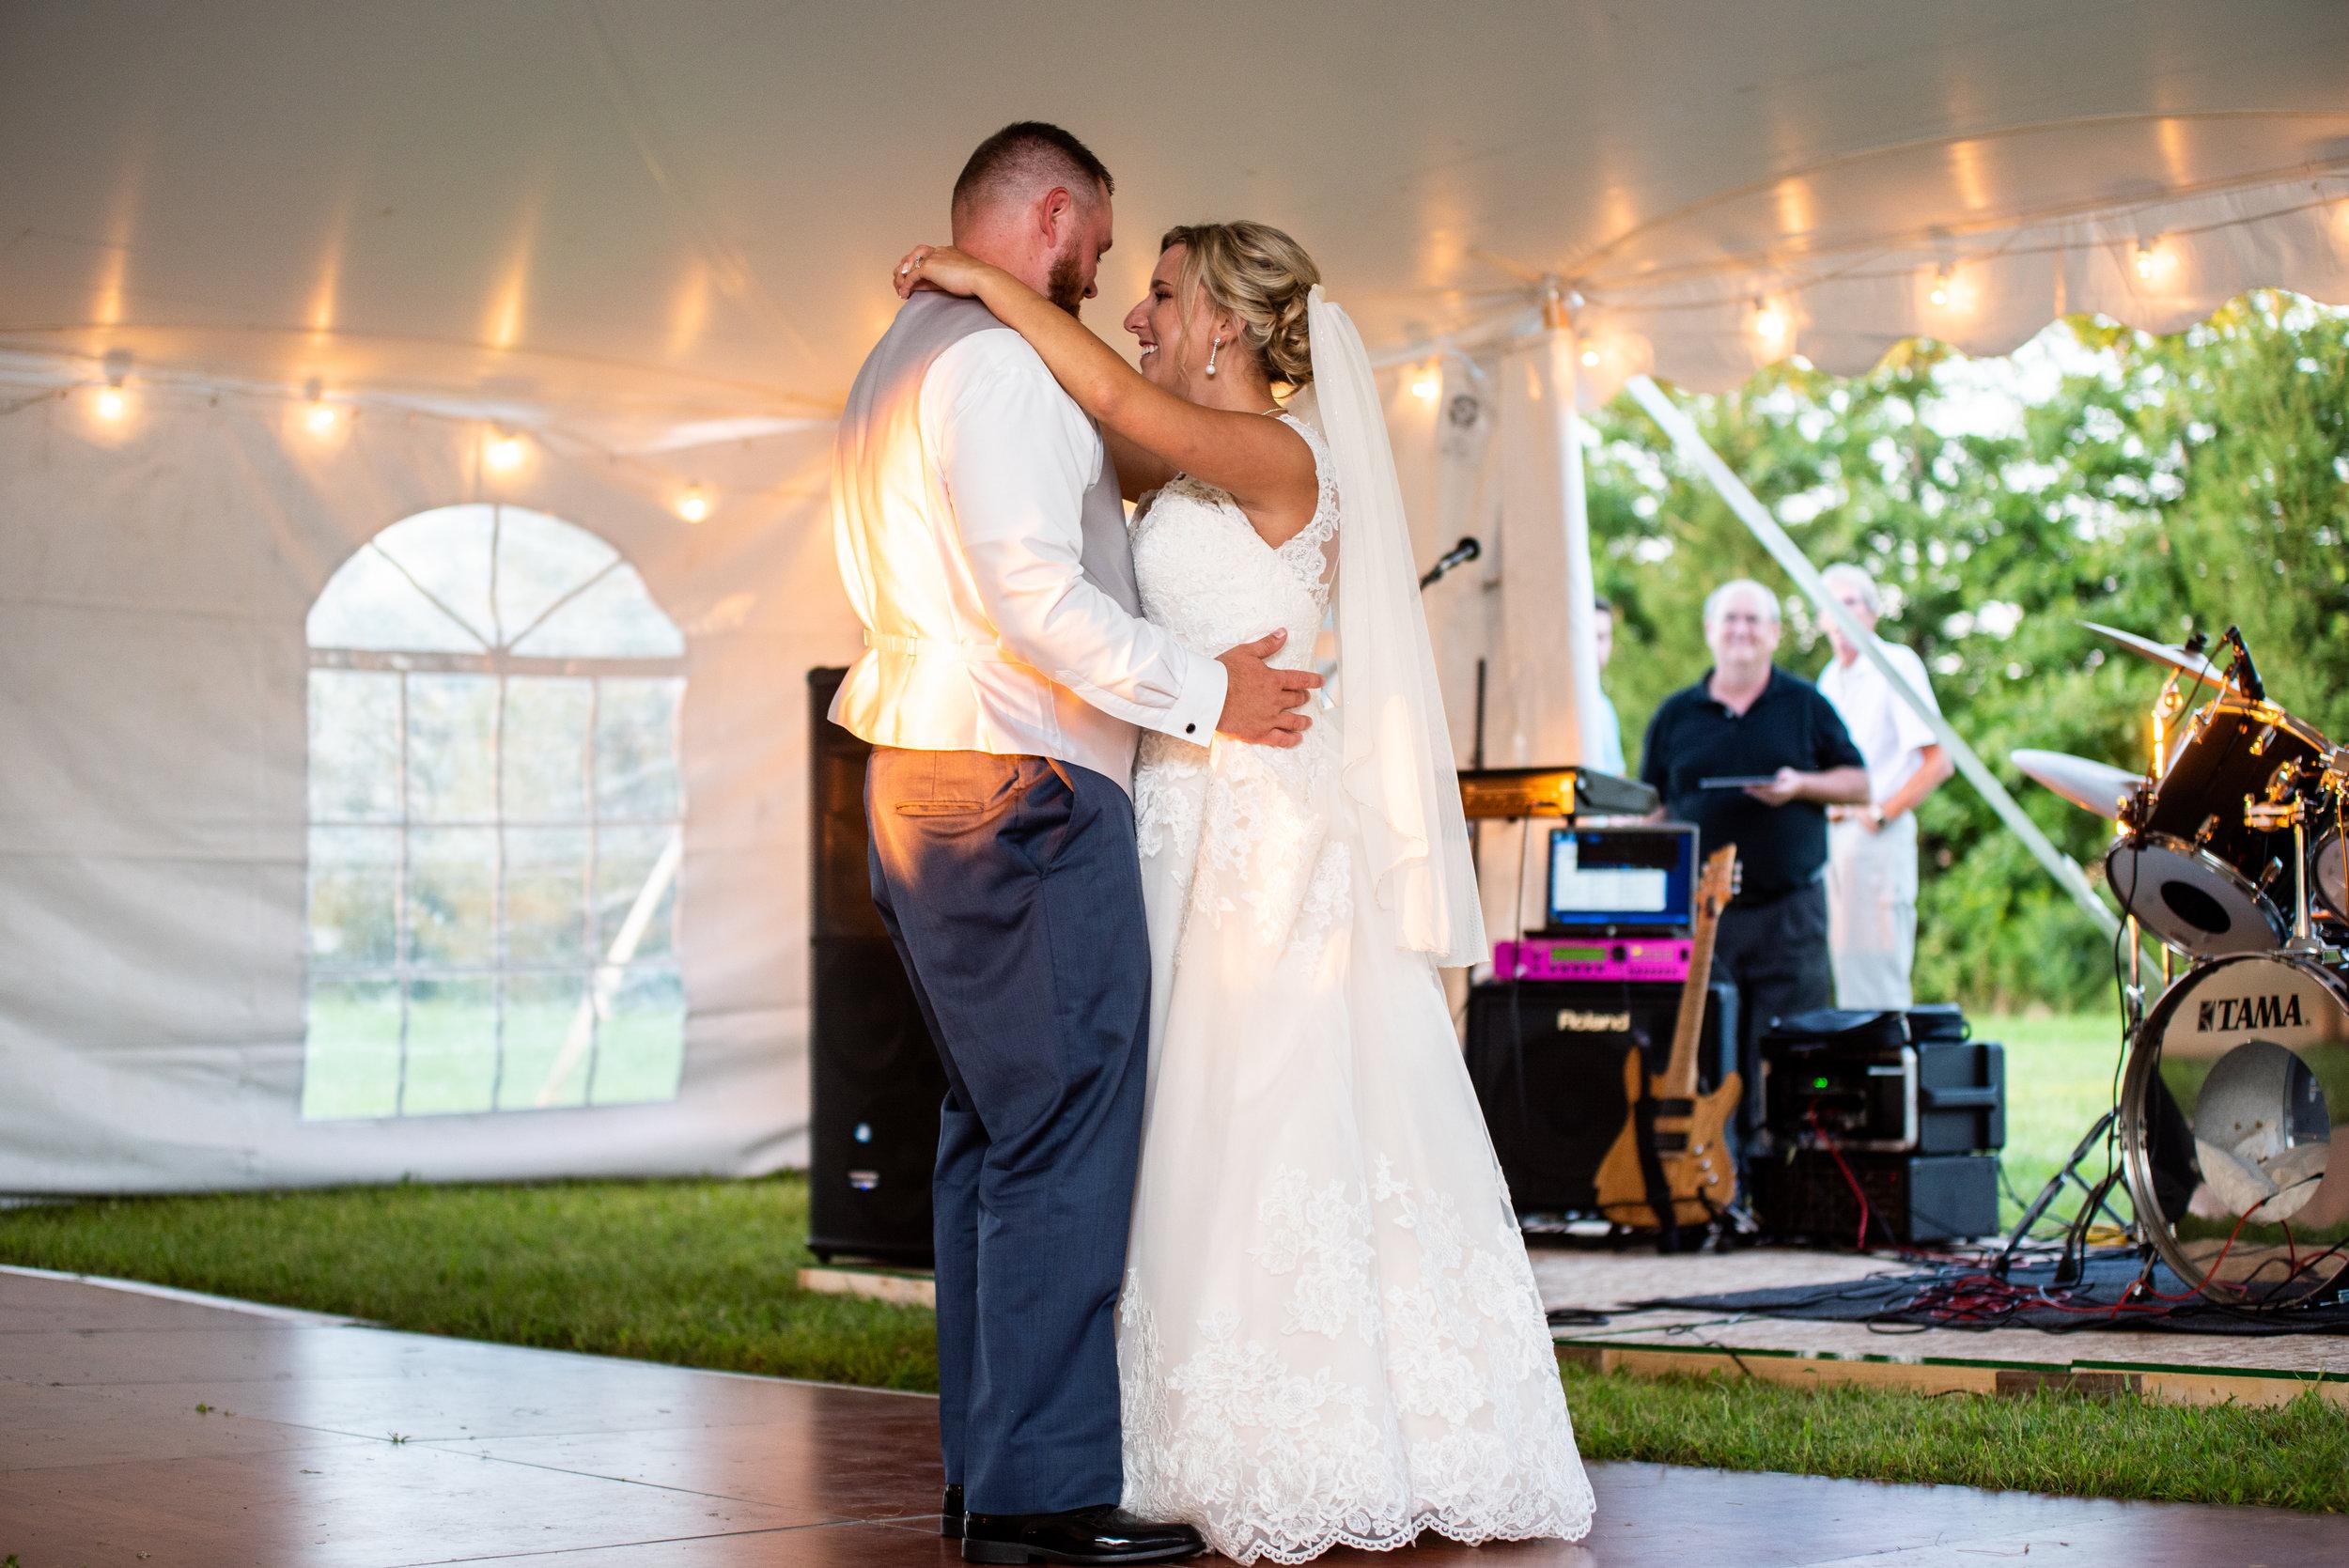 wedding (1 of 1)-207.jpg